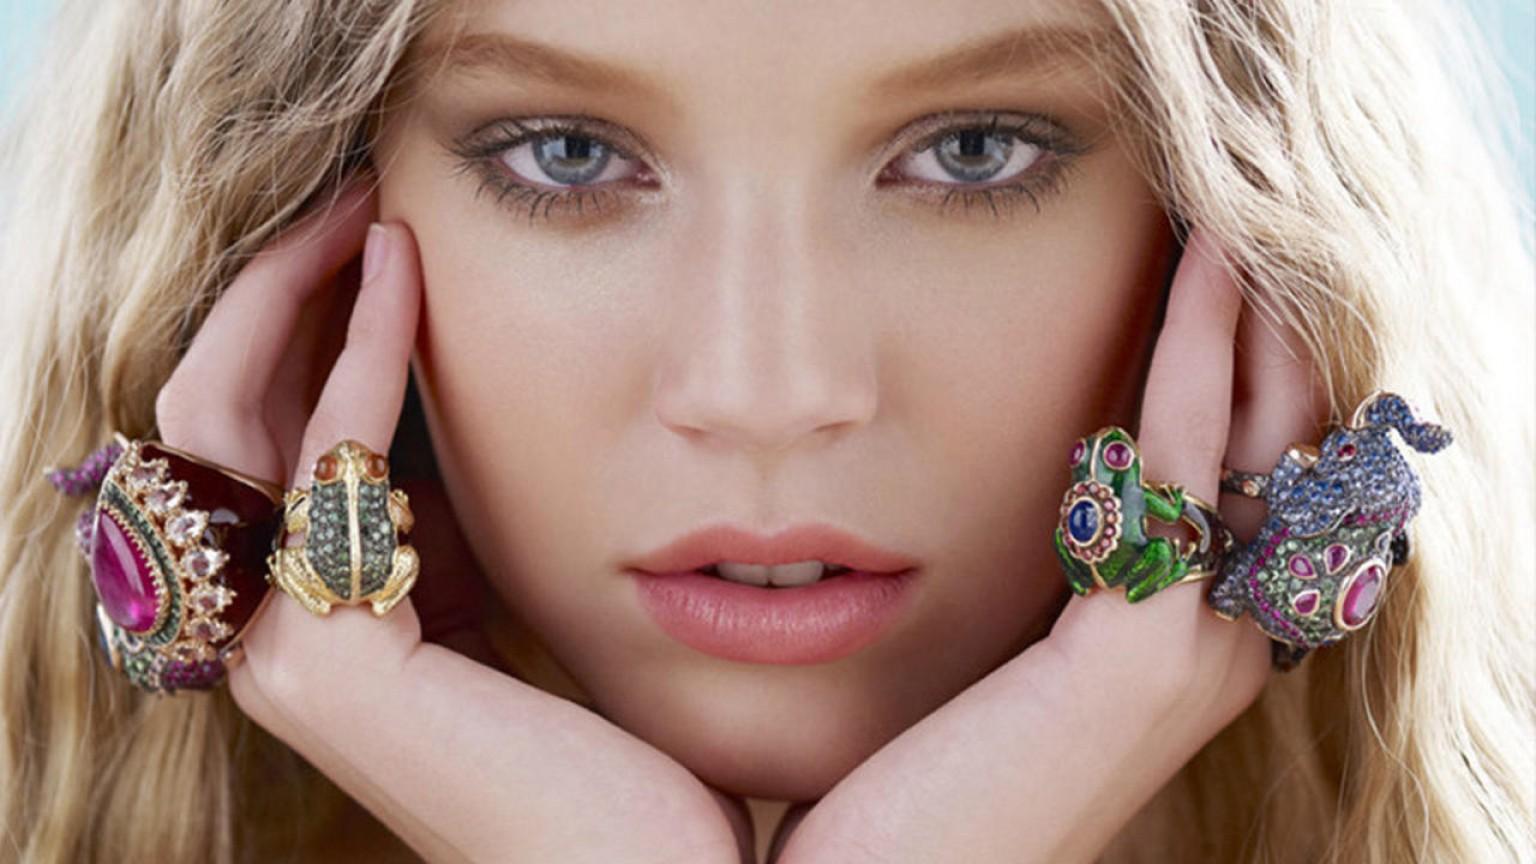 beautiful women wife jewelry mothers day gift ideas